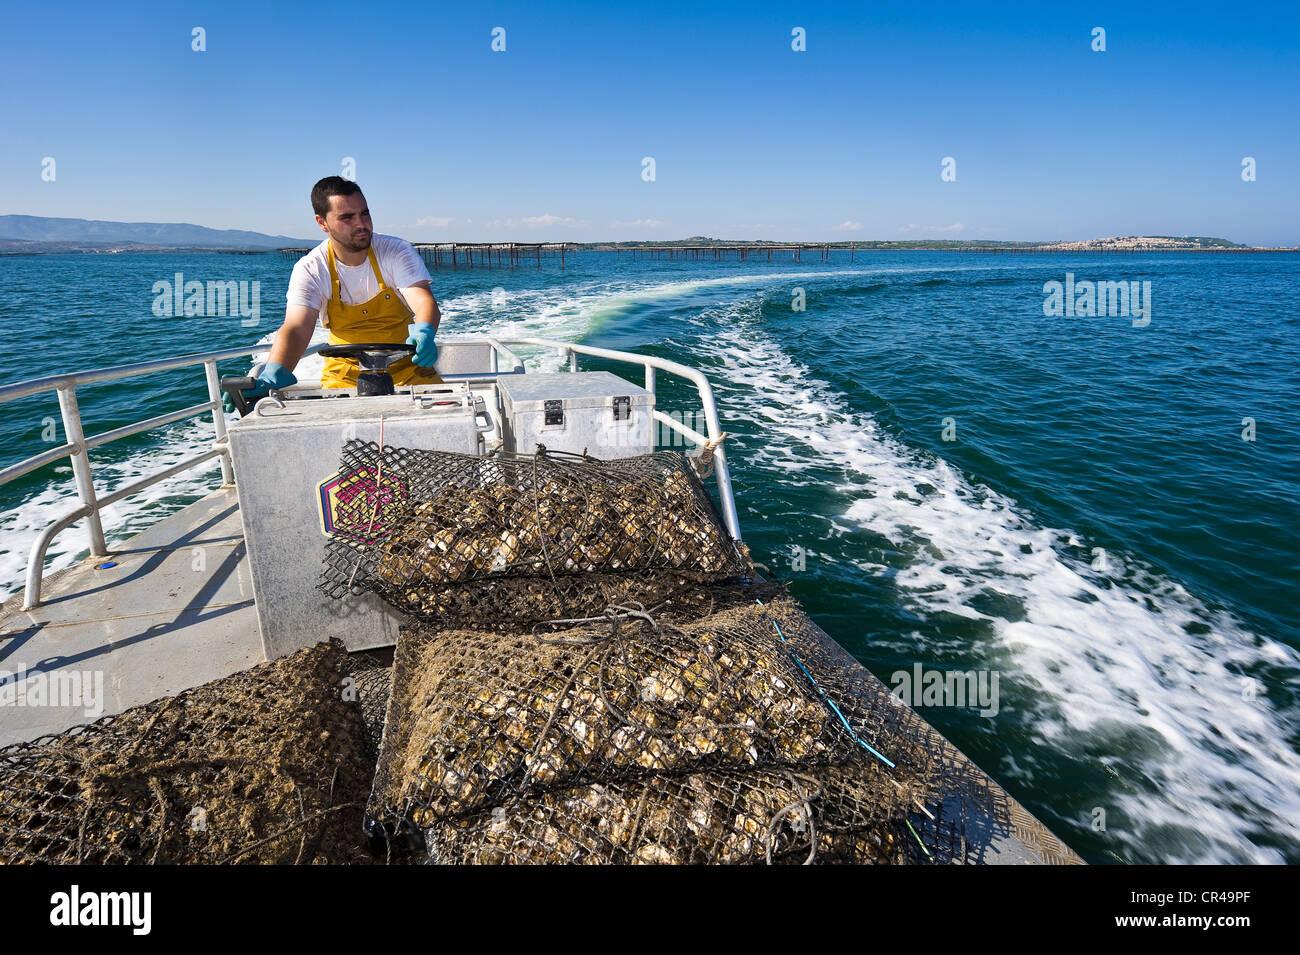 Francia, Aude, Corbières, Leucate Leucate, estanque, plana gabarra con las ostras de una granja conquiliólogos Imagen De Stock